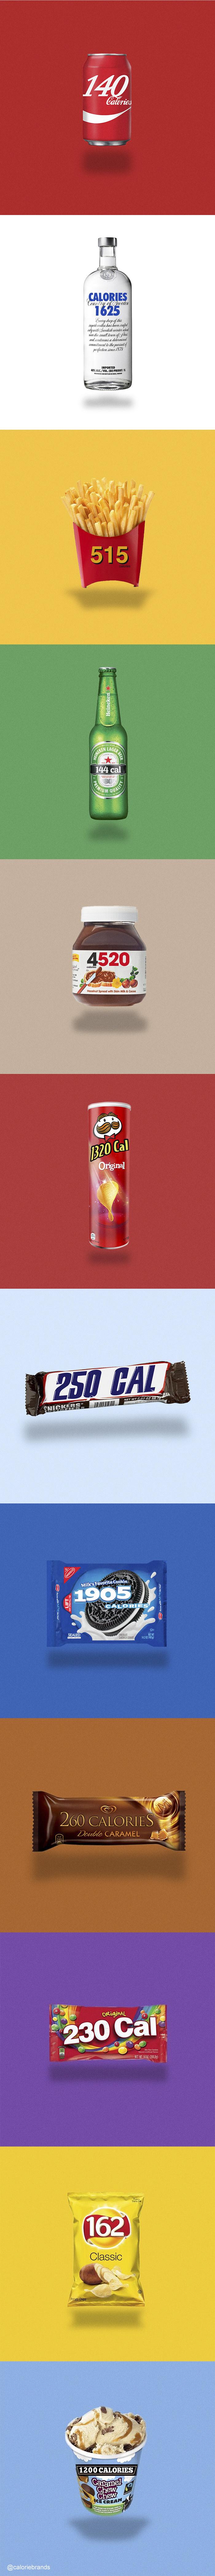 honest-product-logos-caloriebrands1